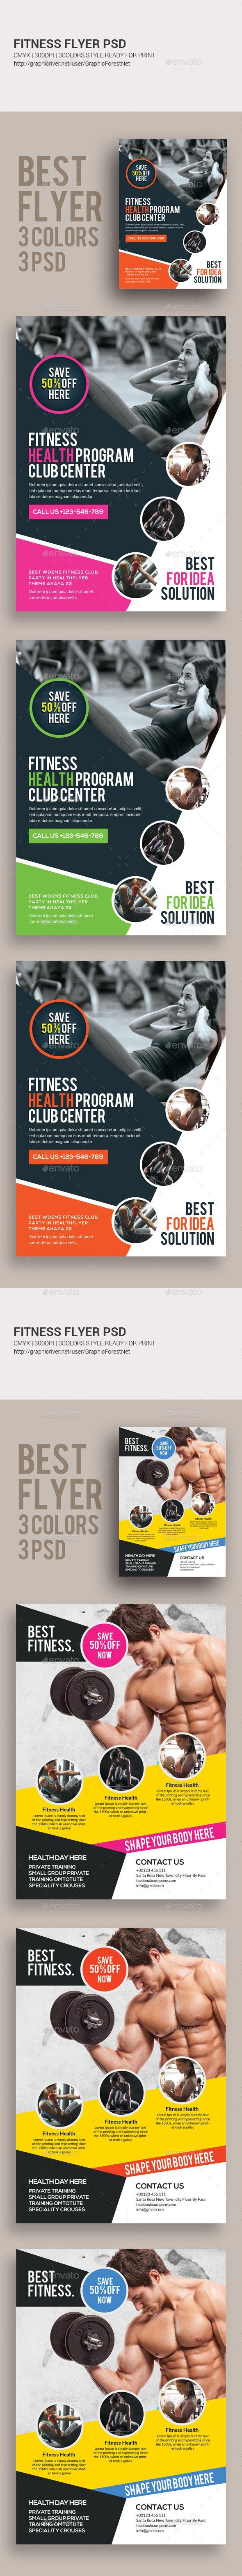 Fitness Flyers Design Template Bundle - Corporate Flyers Design Template PSD. Download here: https://graphicriver.net/item/fitness-flyers-bundle/19249409?ref=yinkira